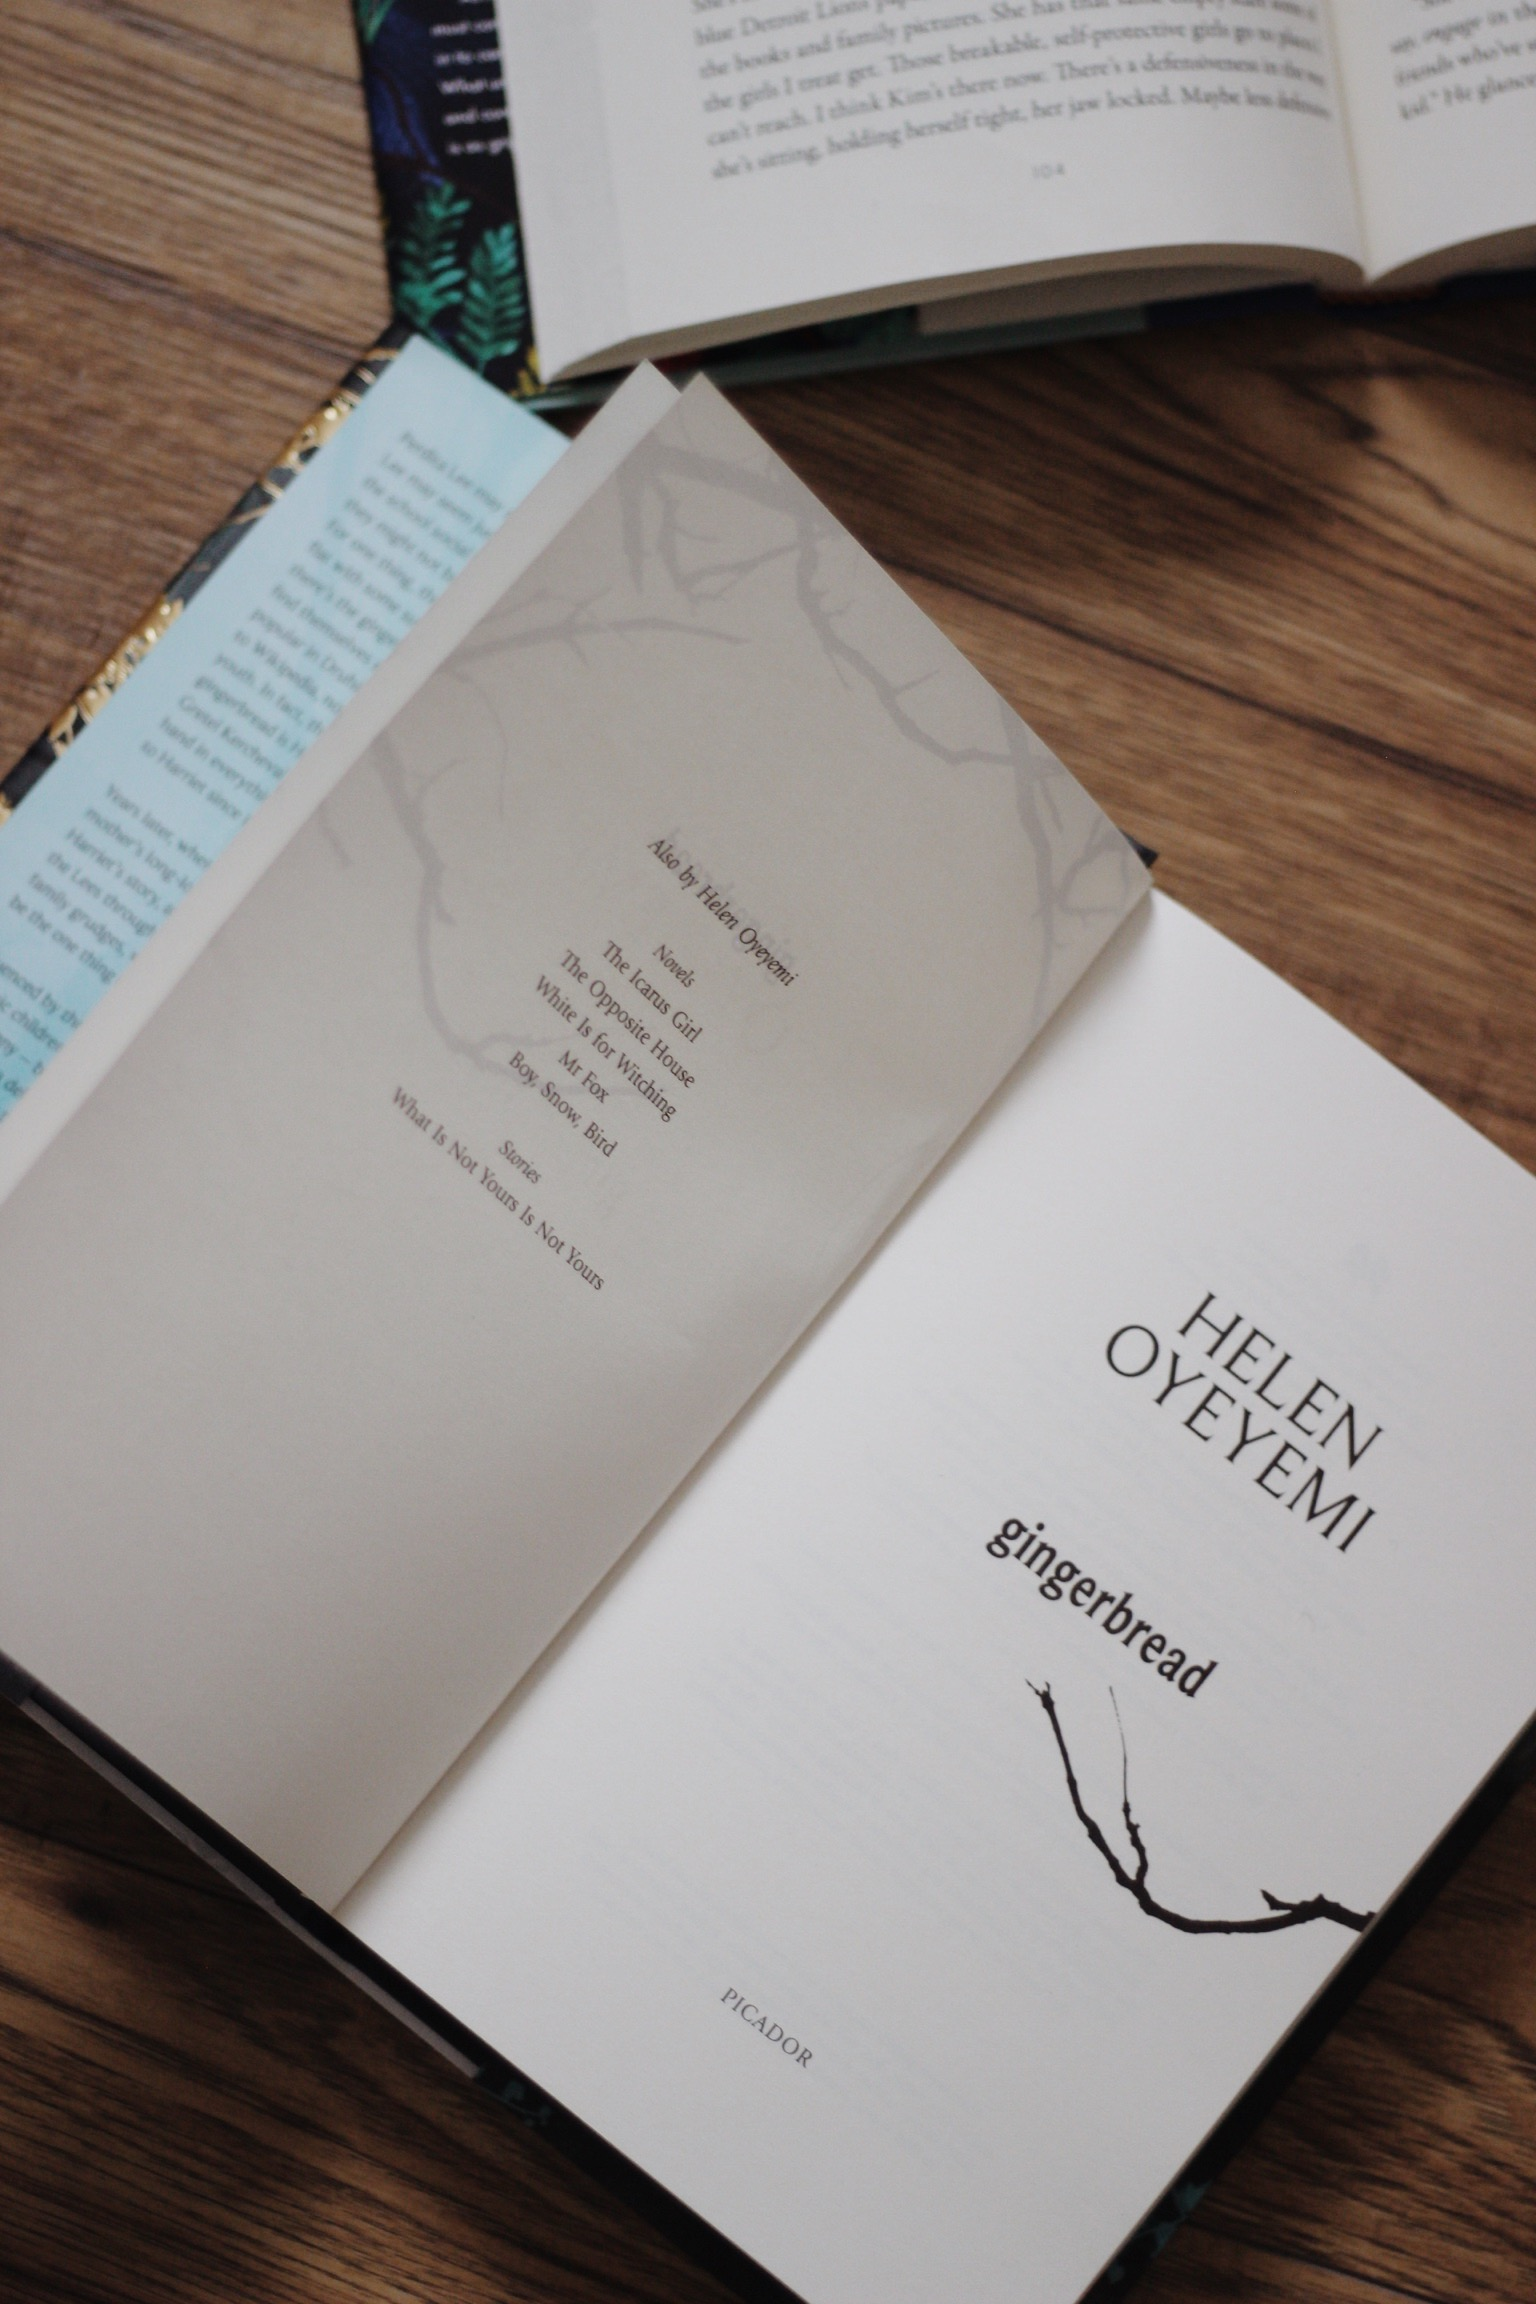 Gingerbread book | Open book